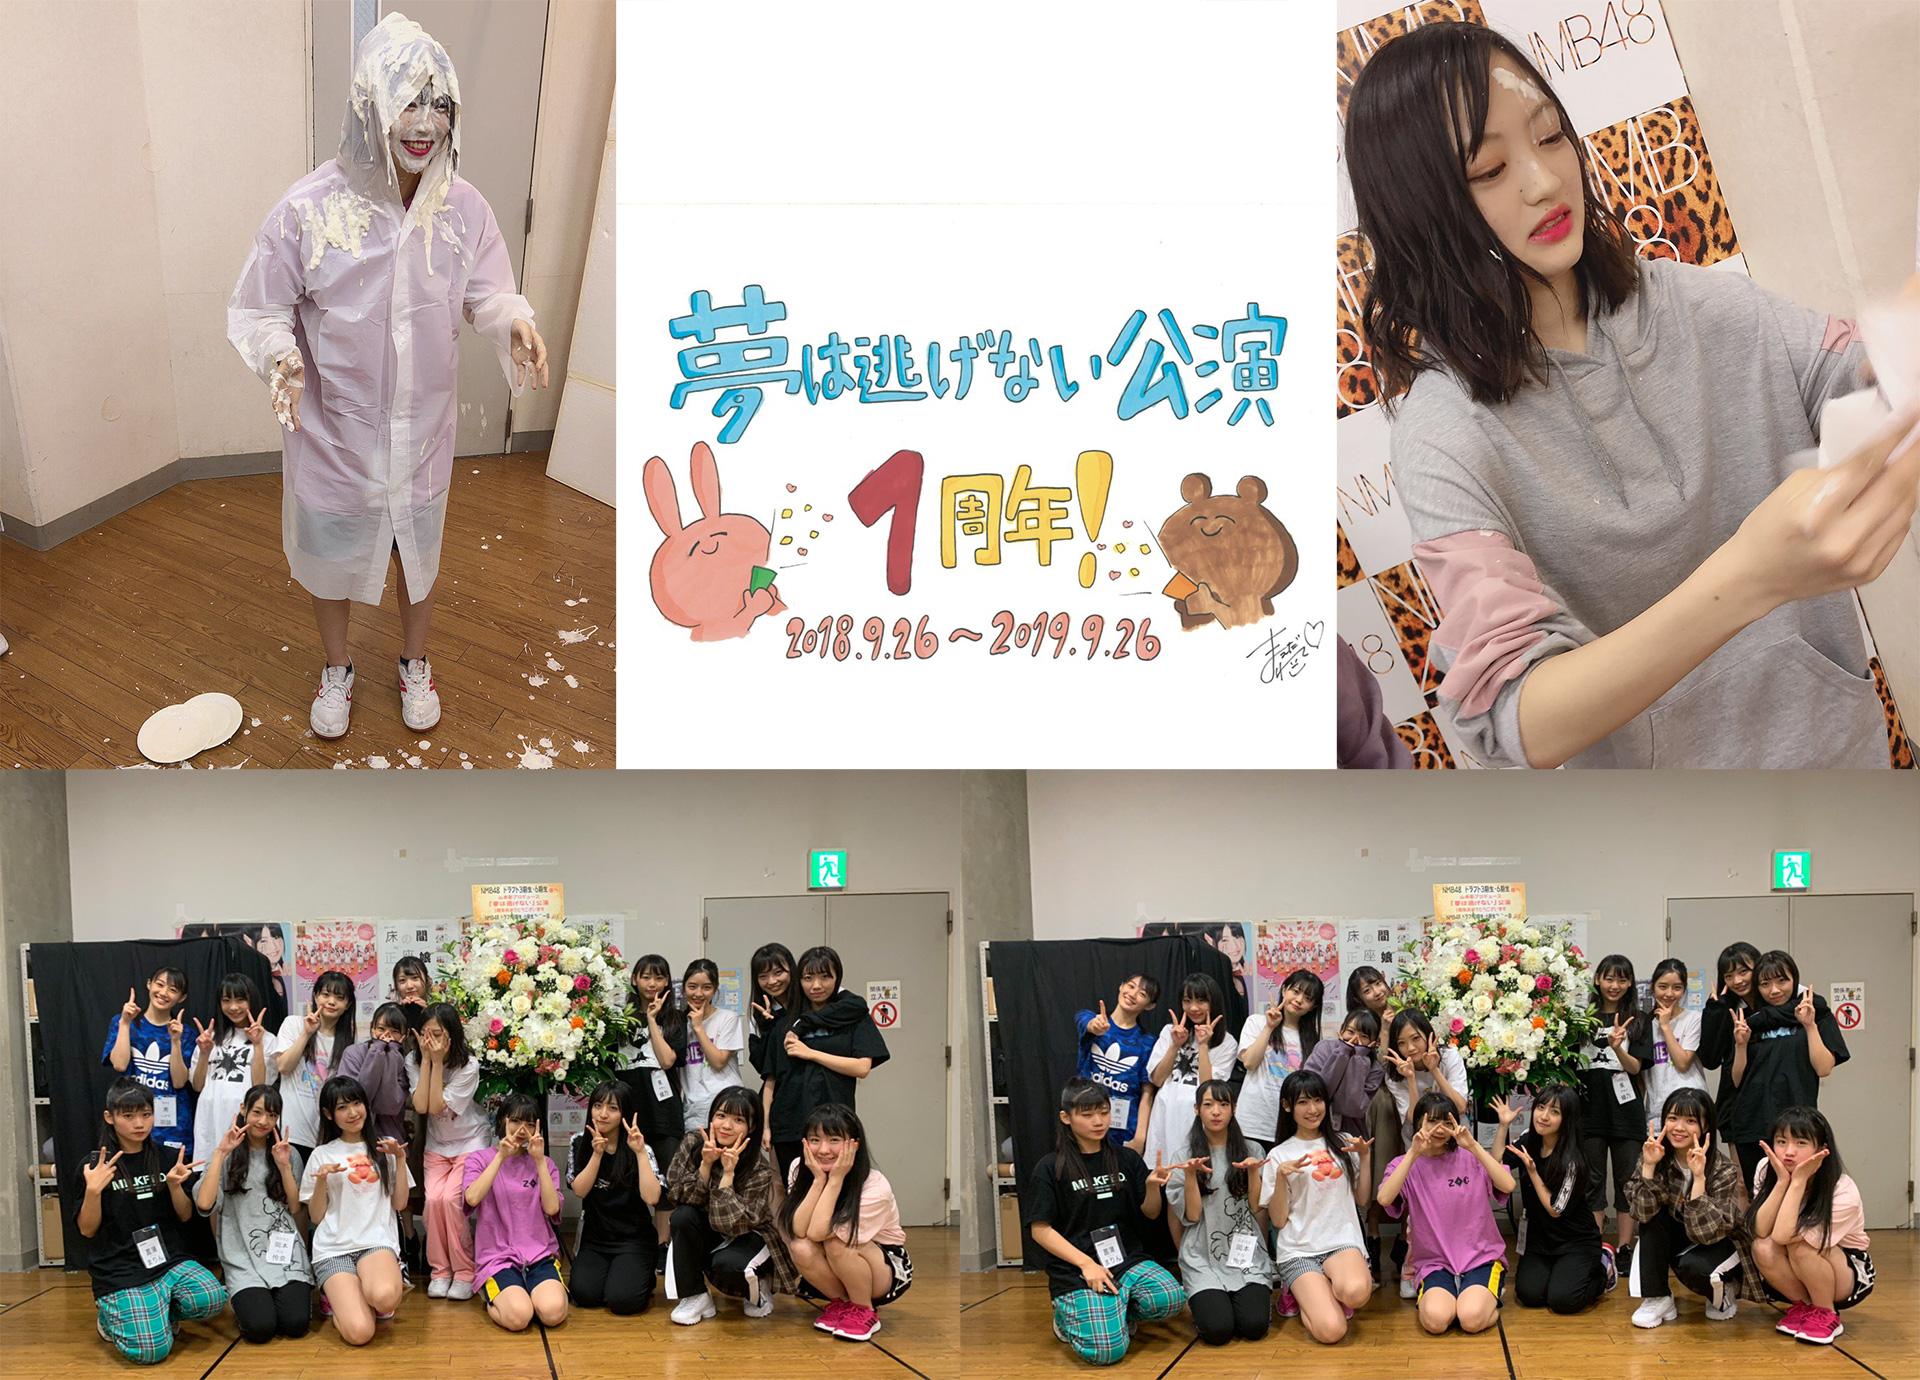 【NMB48】夢は逃げない公演1周年とれいこの誕生日をお祝いする動画がインスタグラムで公開